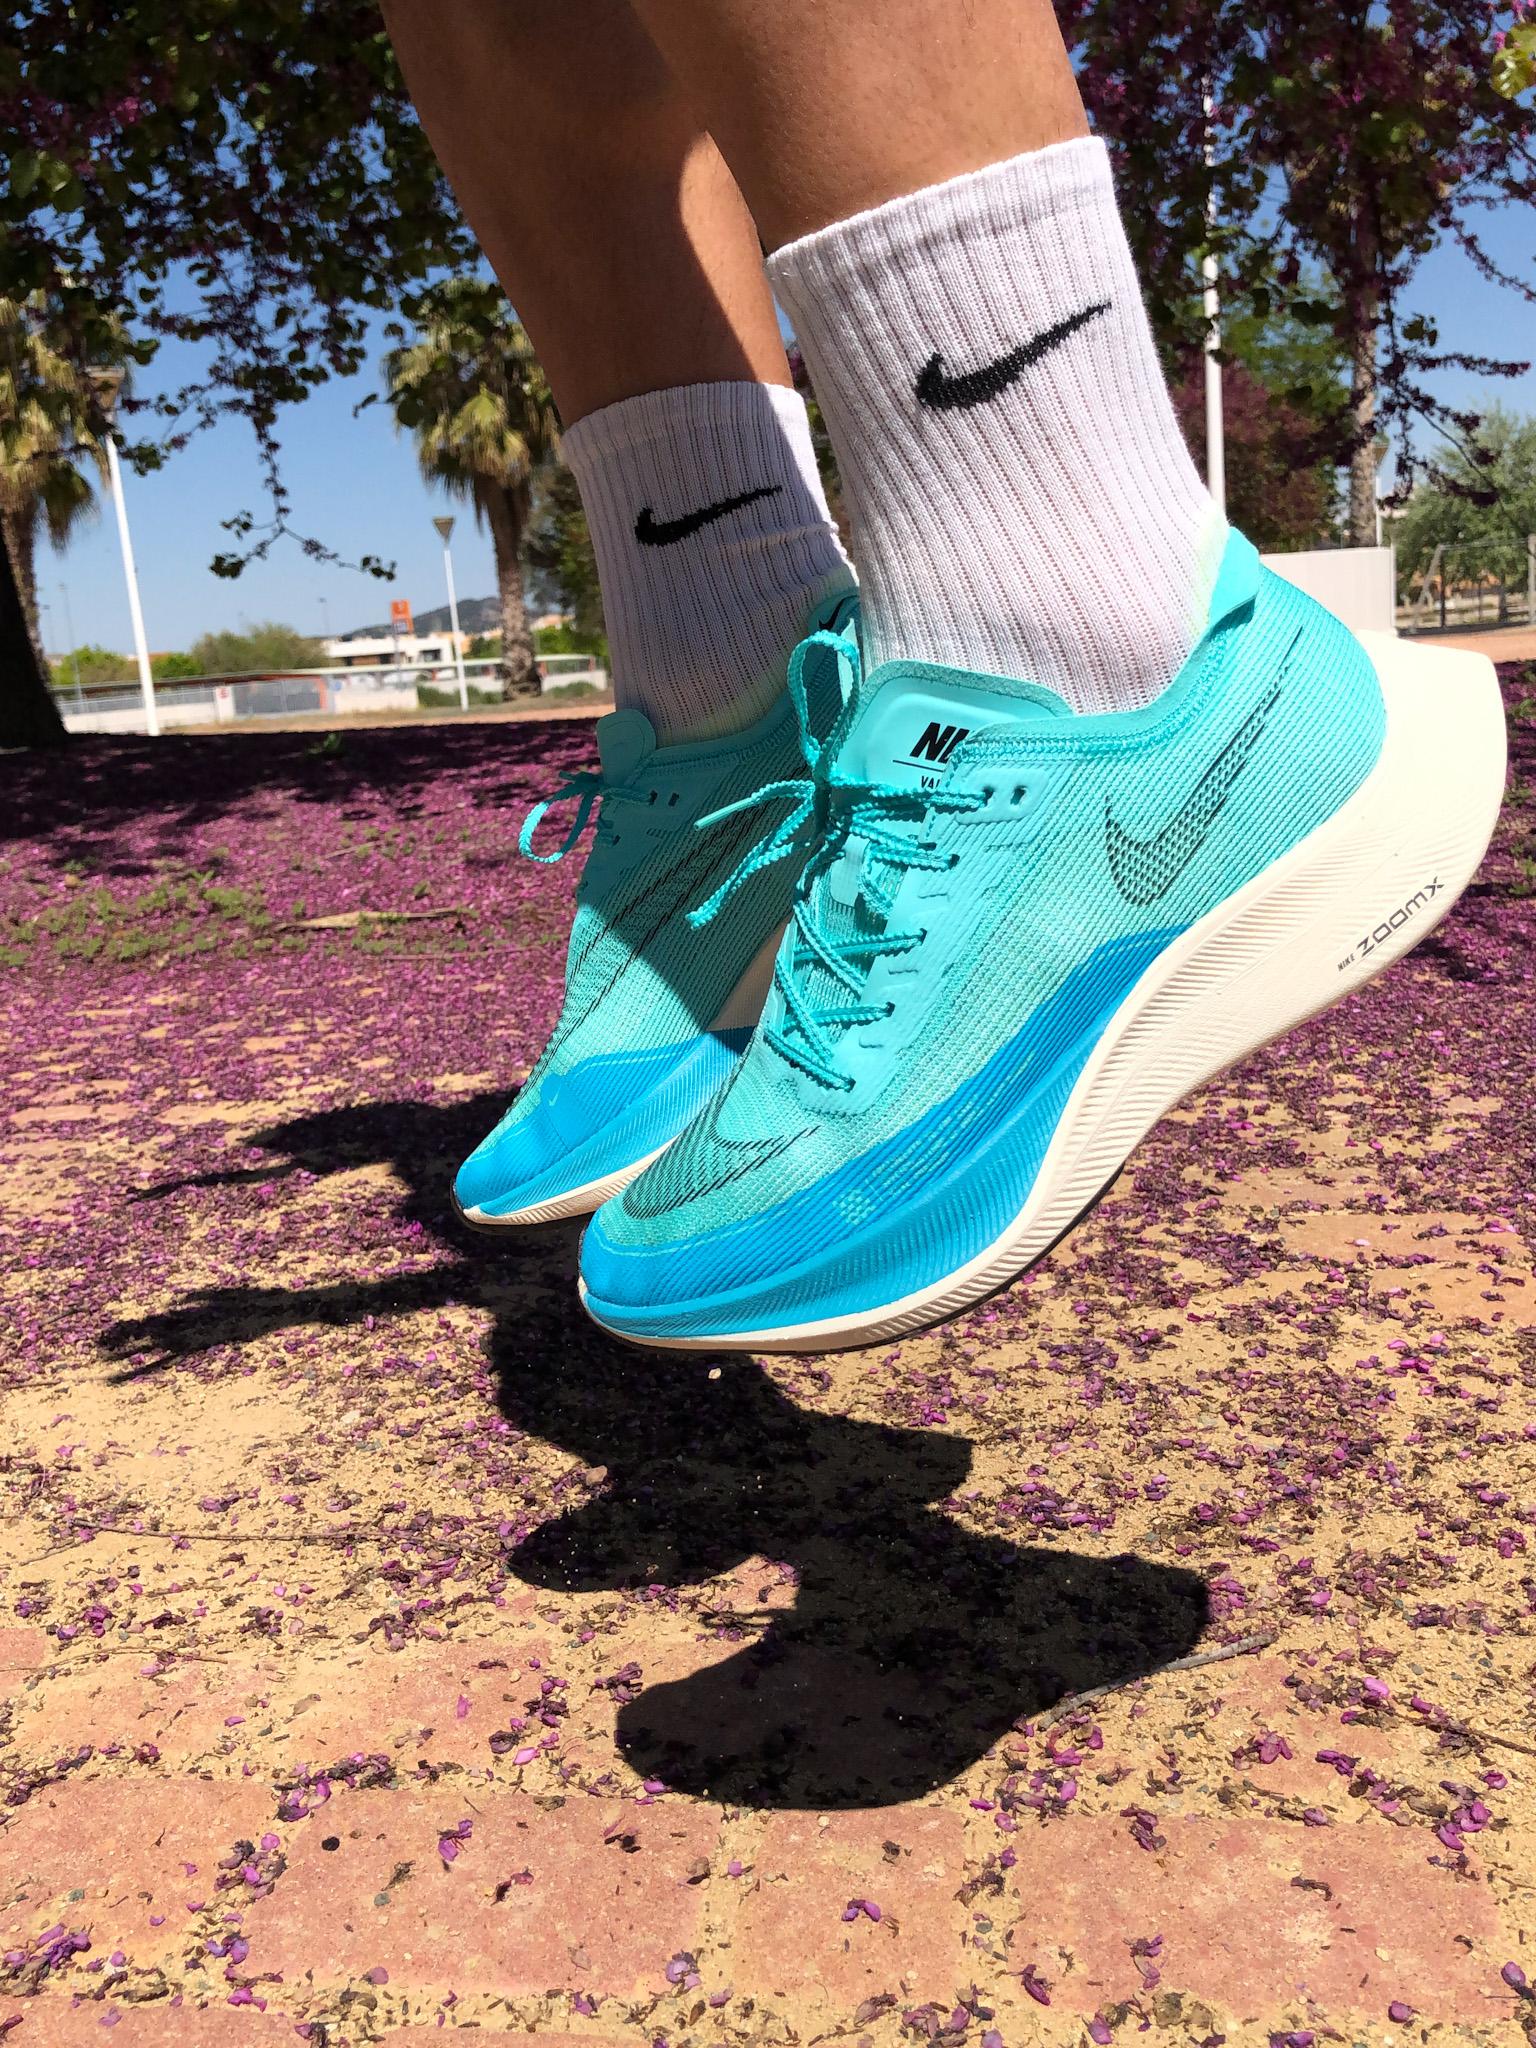 Nike ZoomX Vaporfly Next% 2